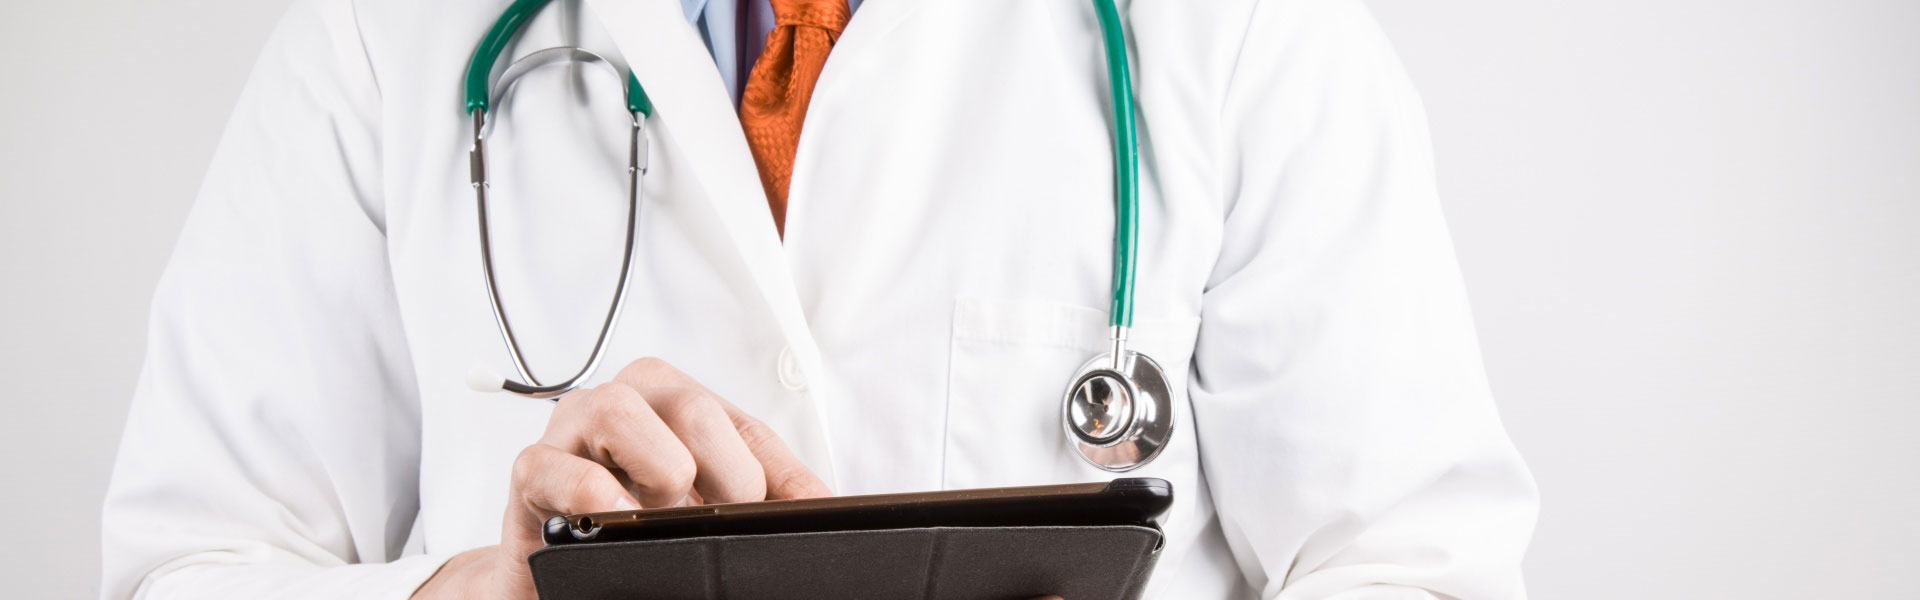 kura-web-urologia-prodotti